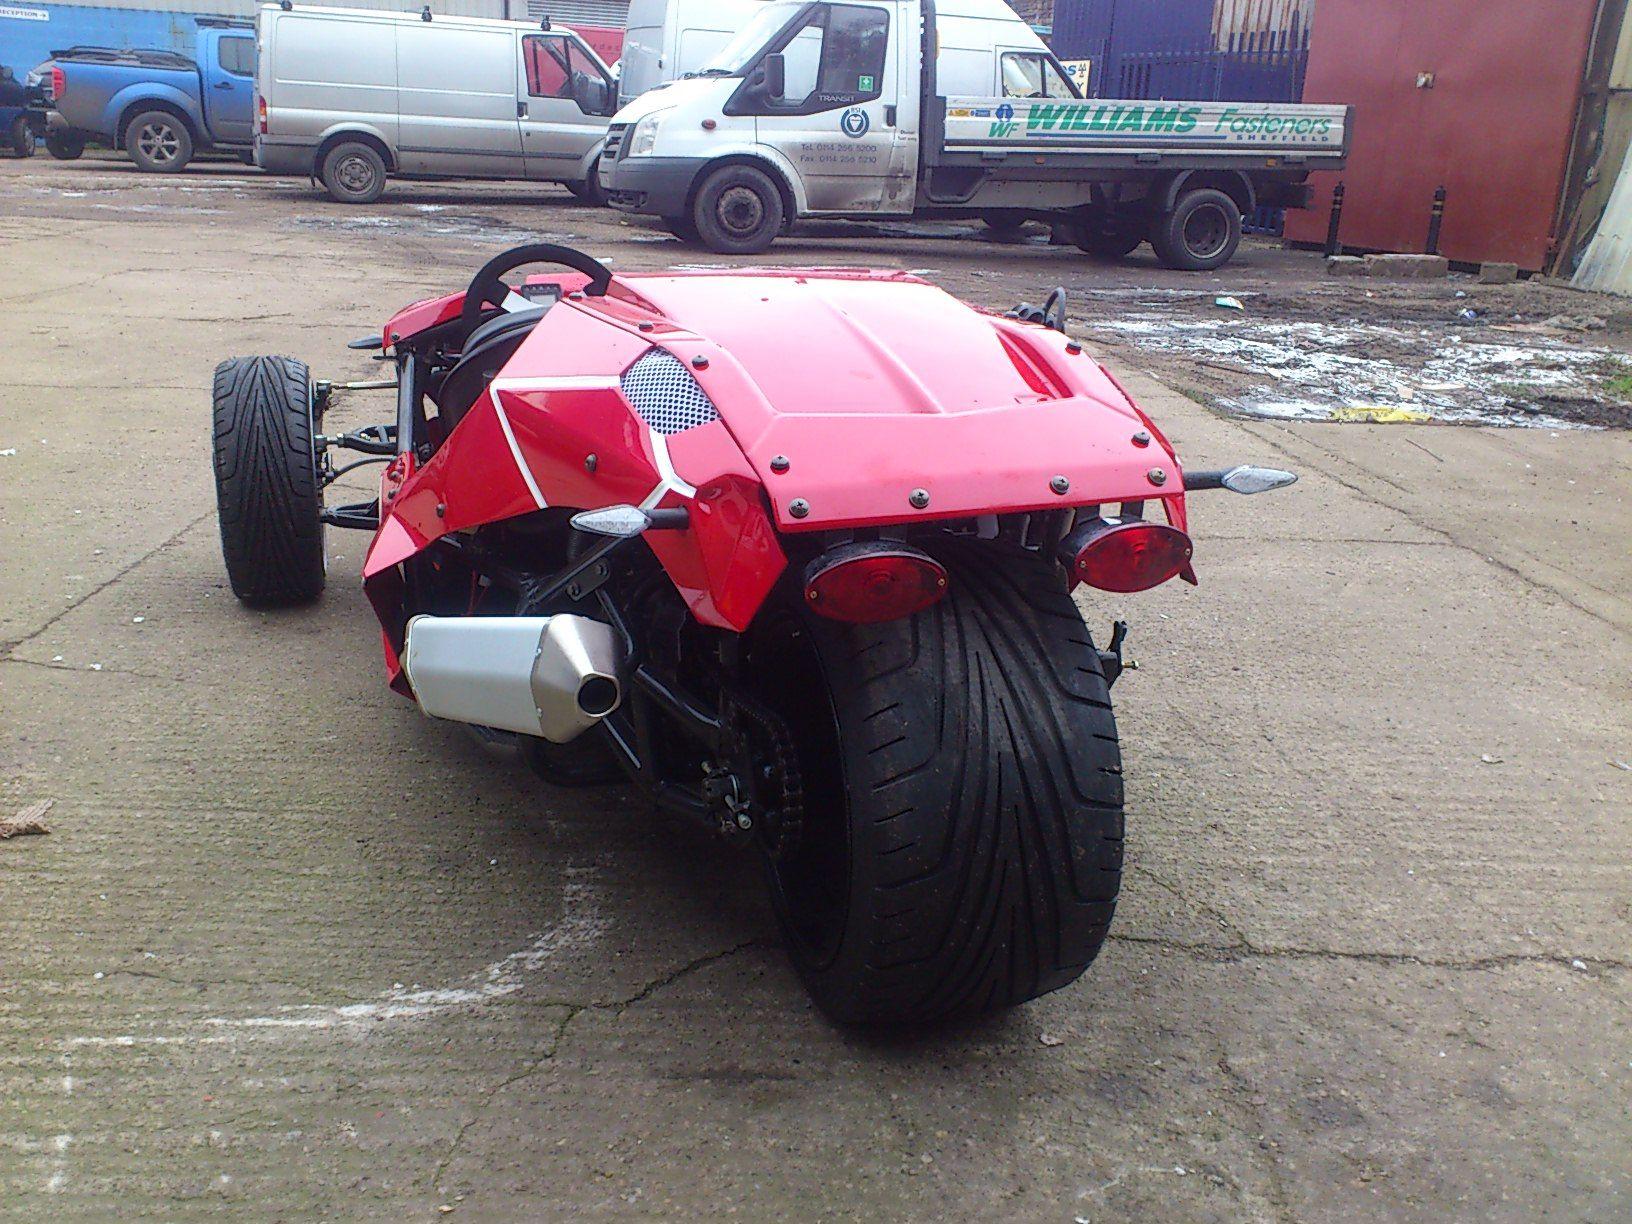 Awesome Street Legal 3 Wheeler Sports Car 6 000 Scorpionsportscars